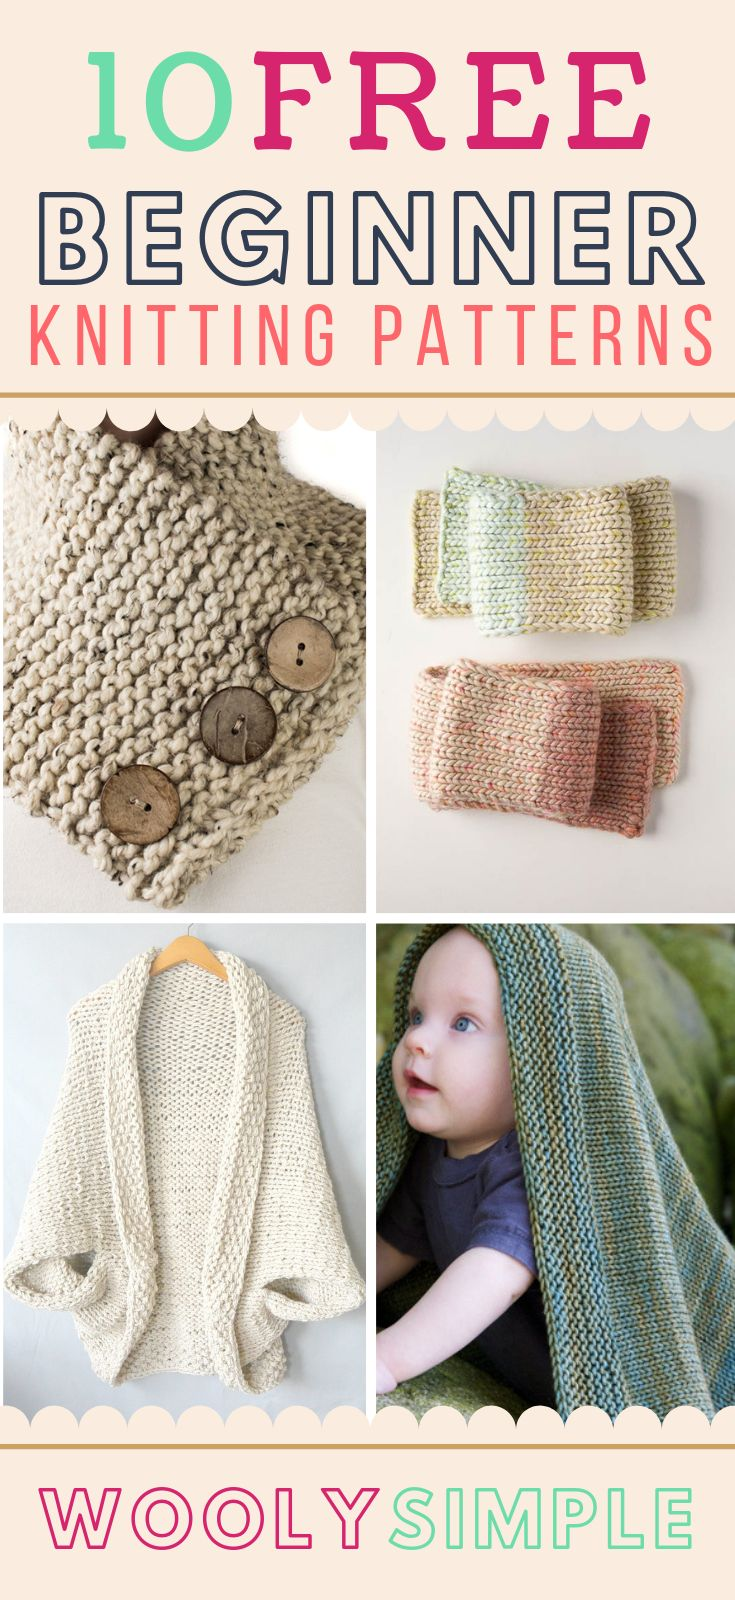 10 Free Beginner Knitting Patterns for Absolute Beginners